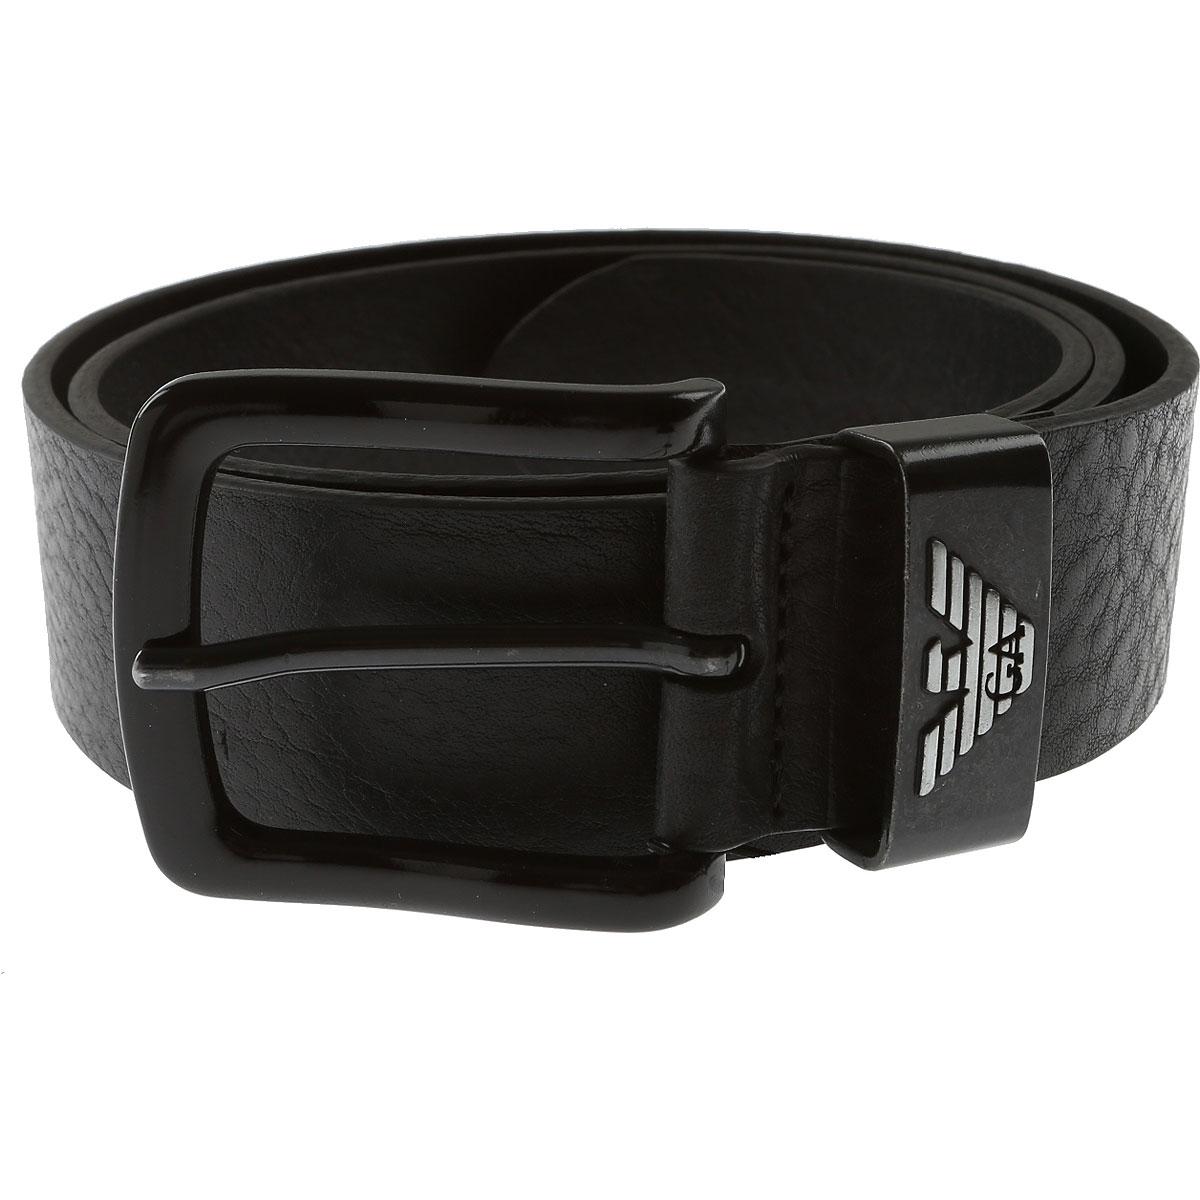 Emporio Armani Mens Belts, Black, Leather, 2017, 38 40 44